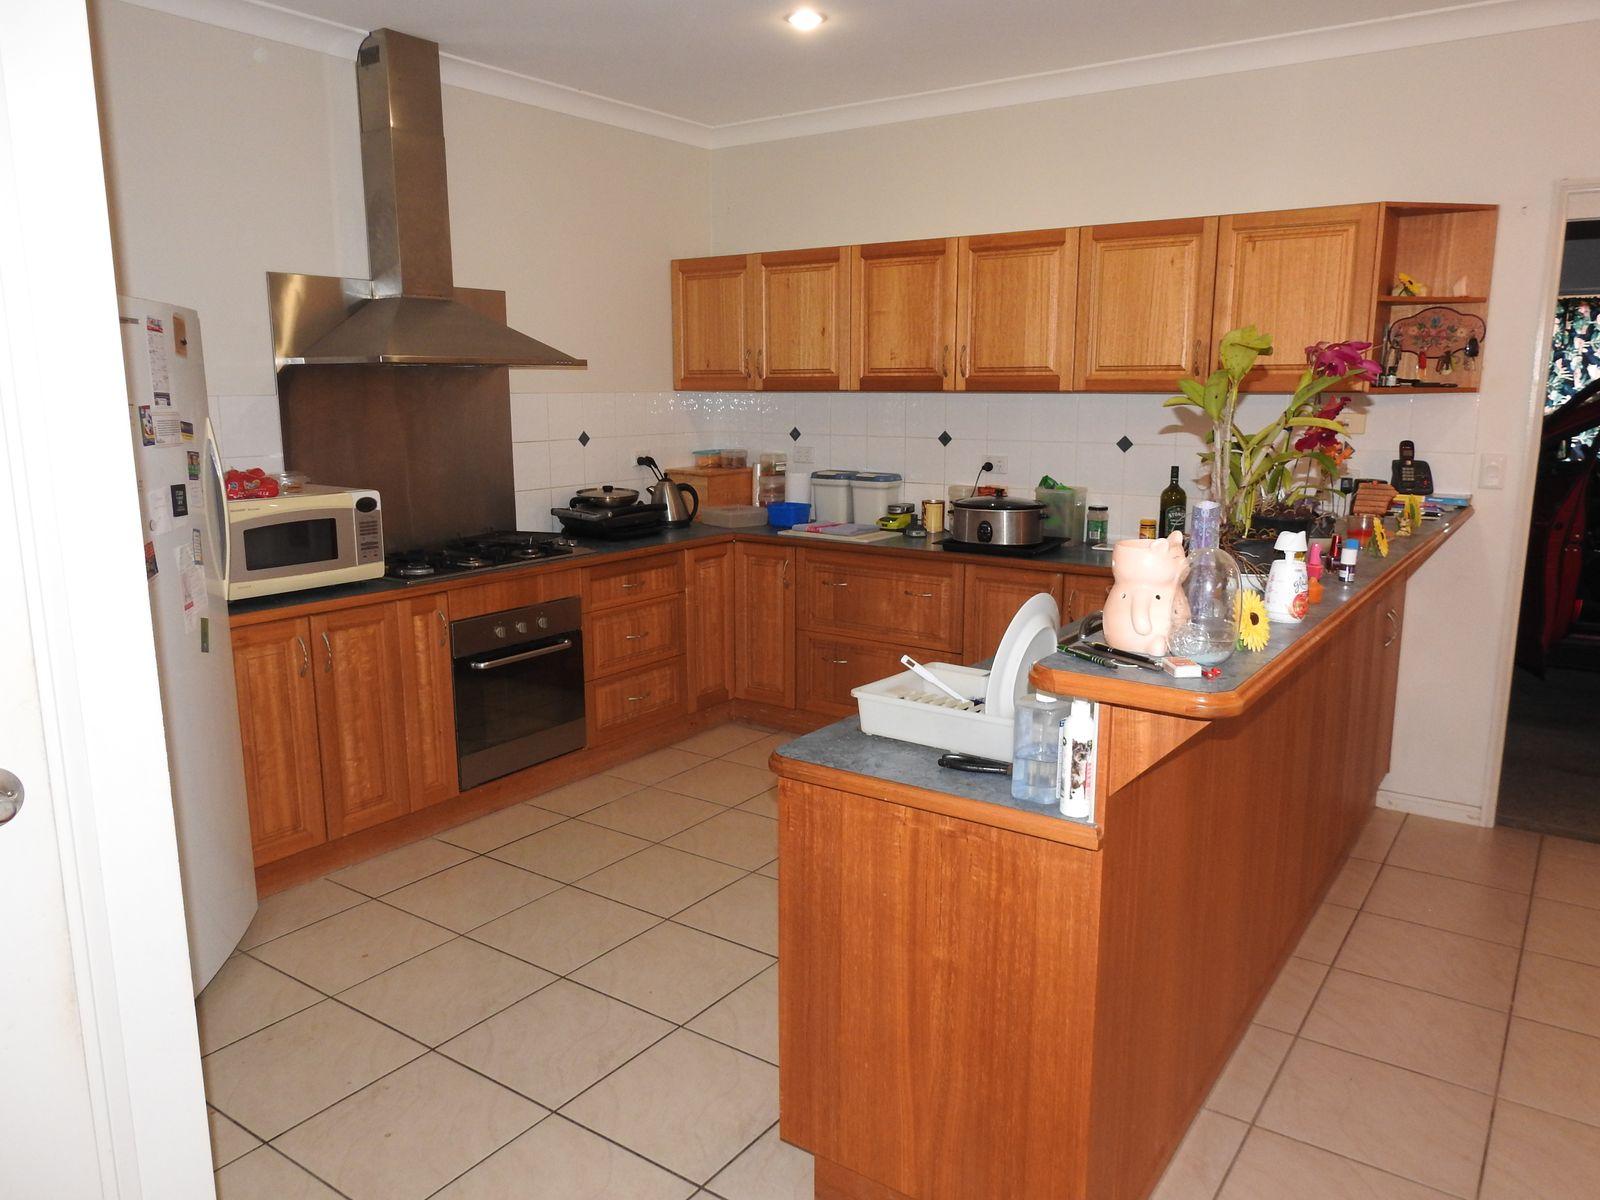 97 Sunnybrae Circuit, Redridge, QLD 4660